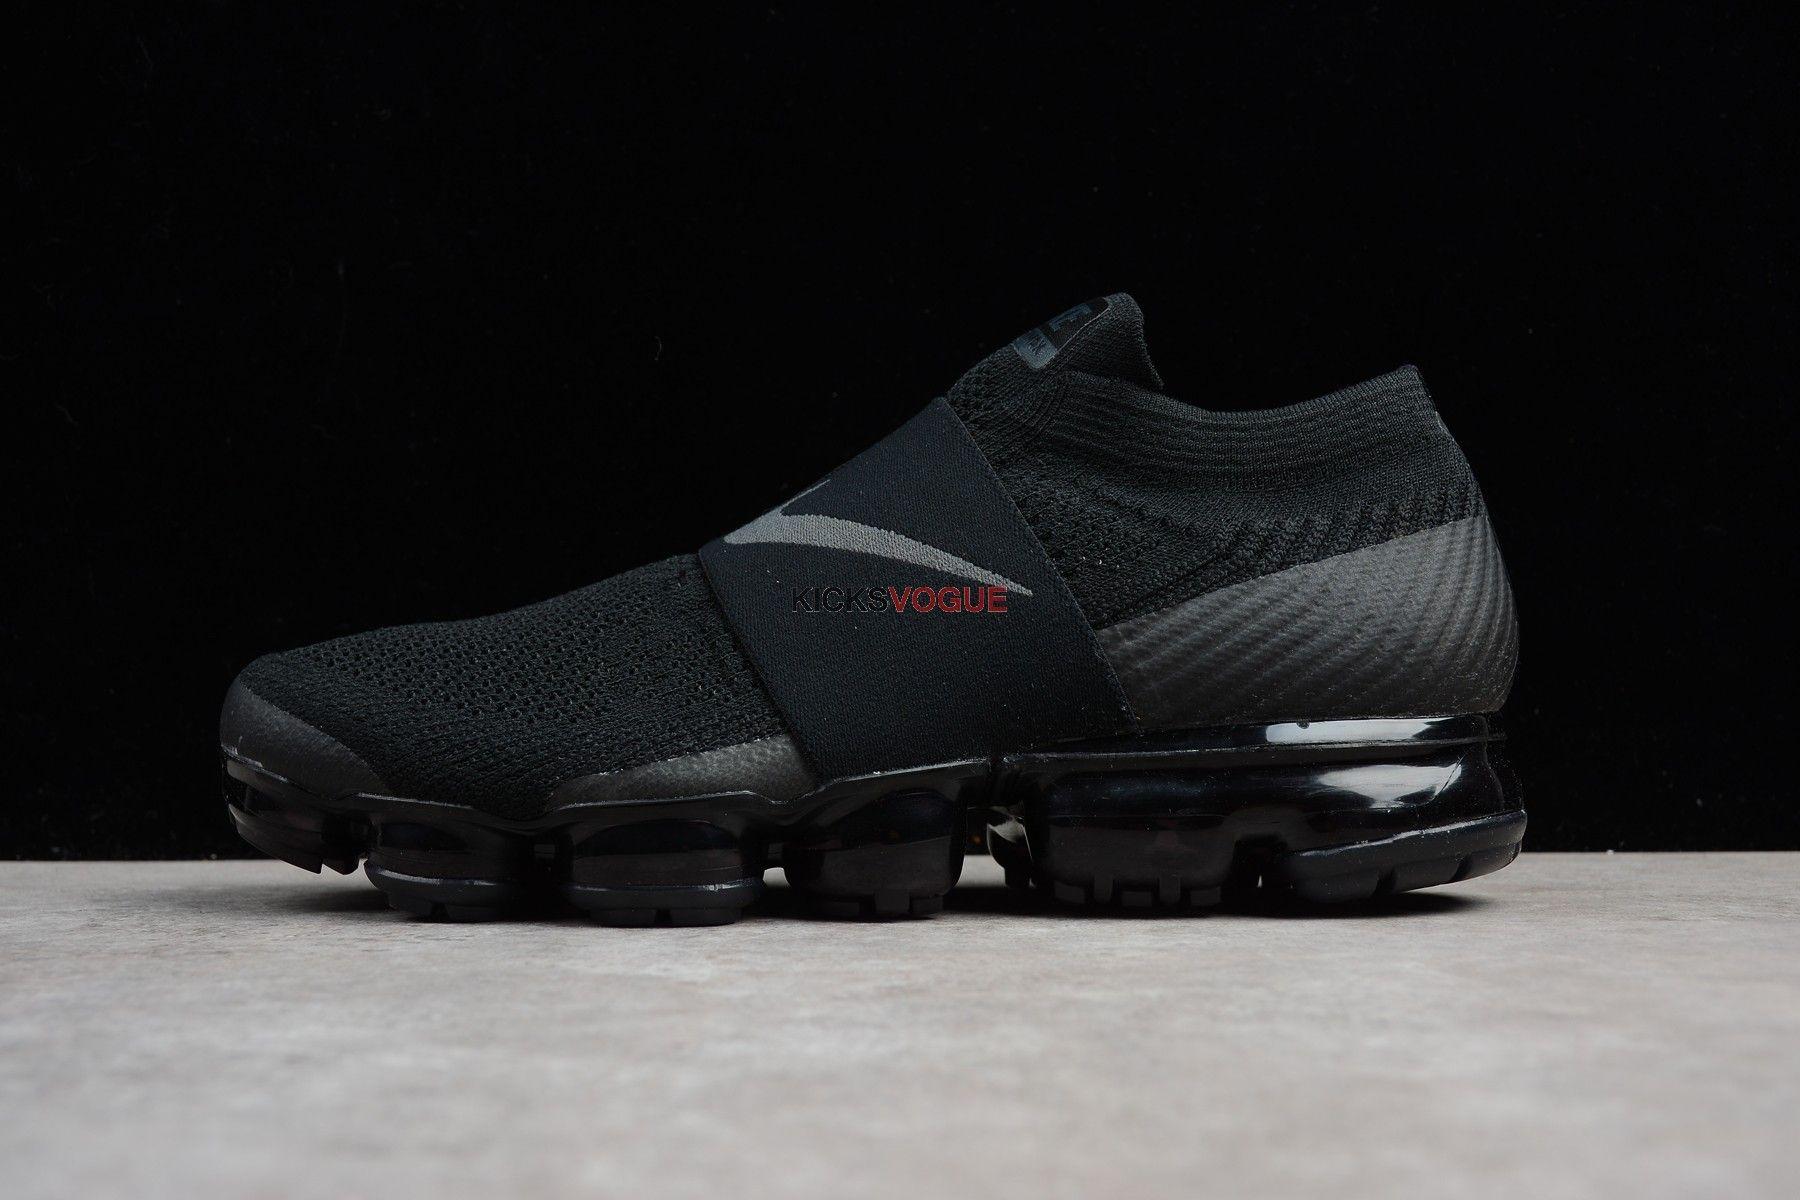 82c2a178a865 Nike Air VaporMax Moc Flyknit Laceless  vapormax  nike  nikeairvapormaxmoc